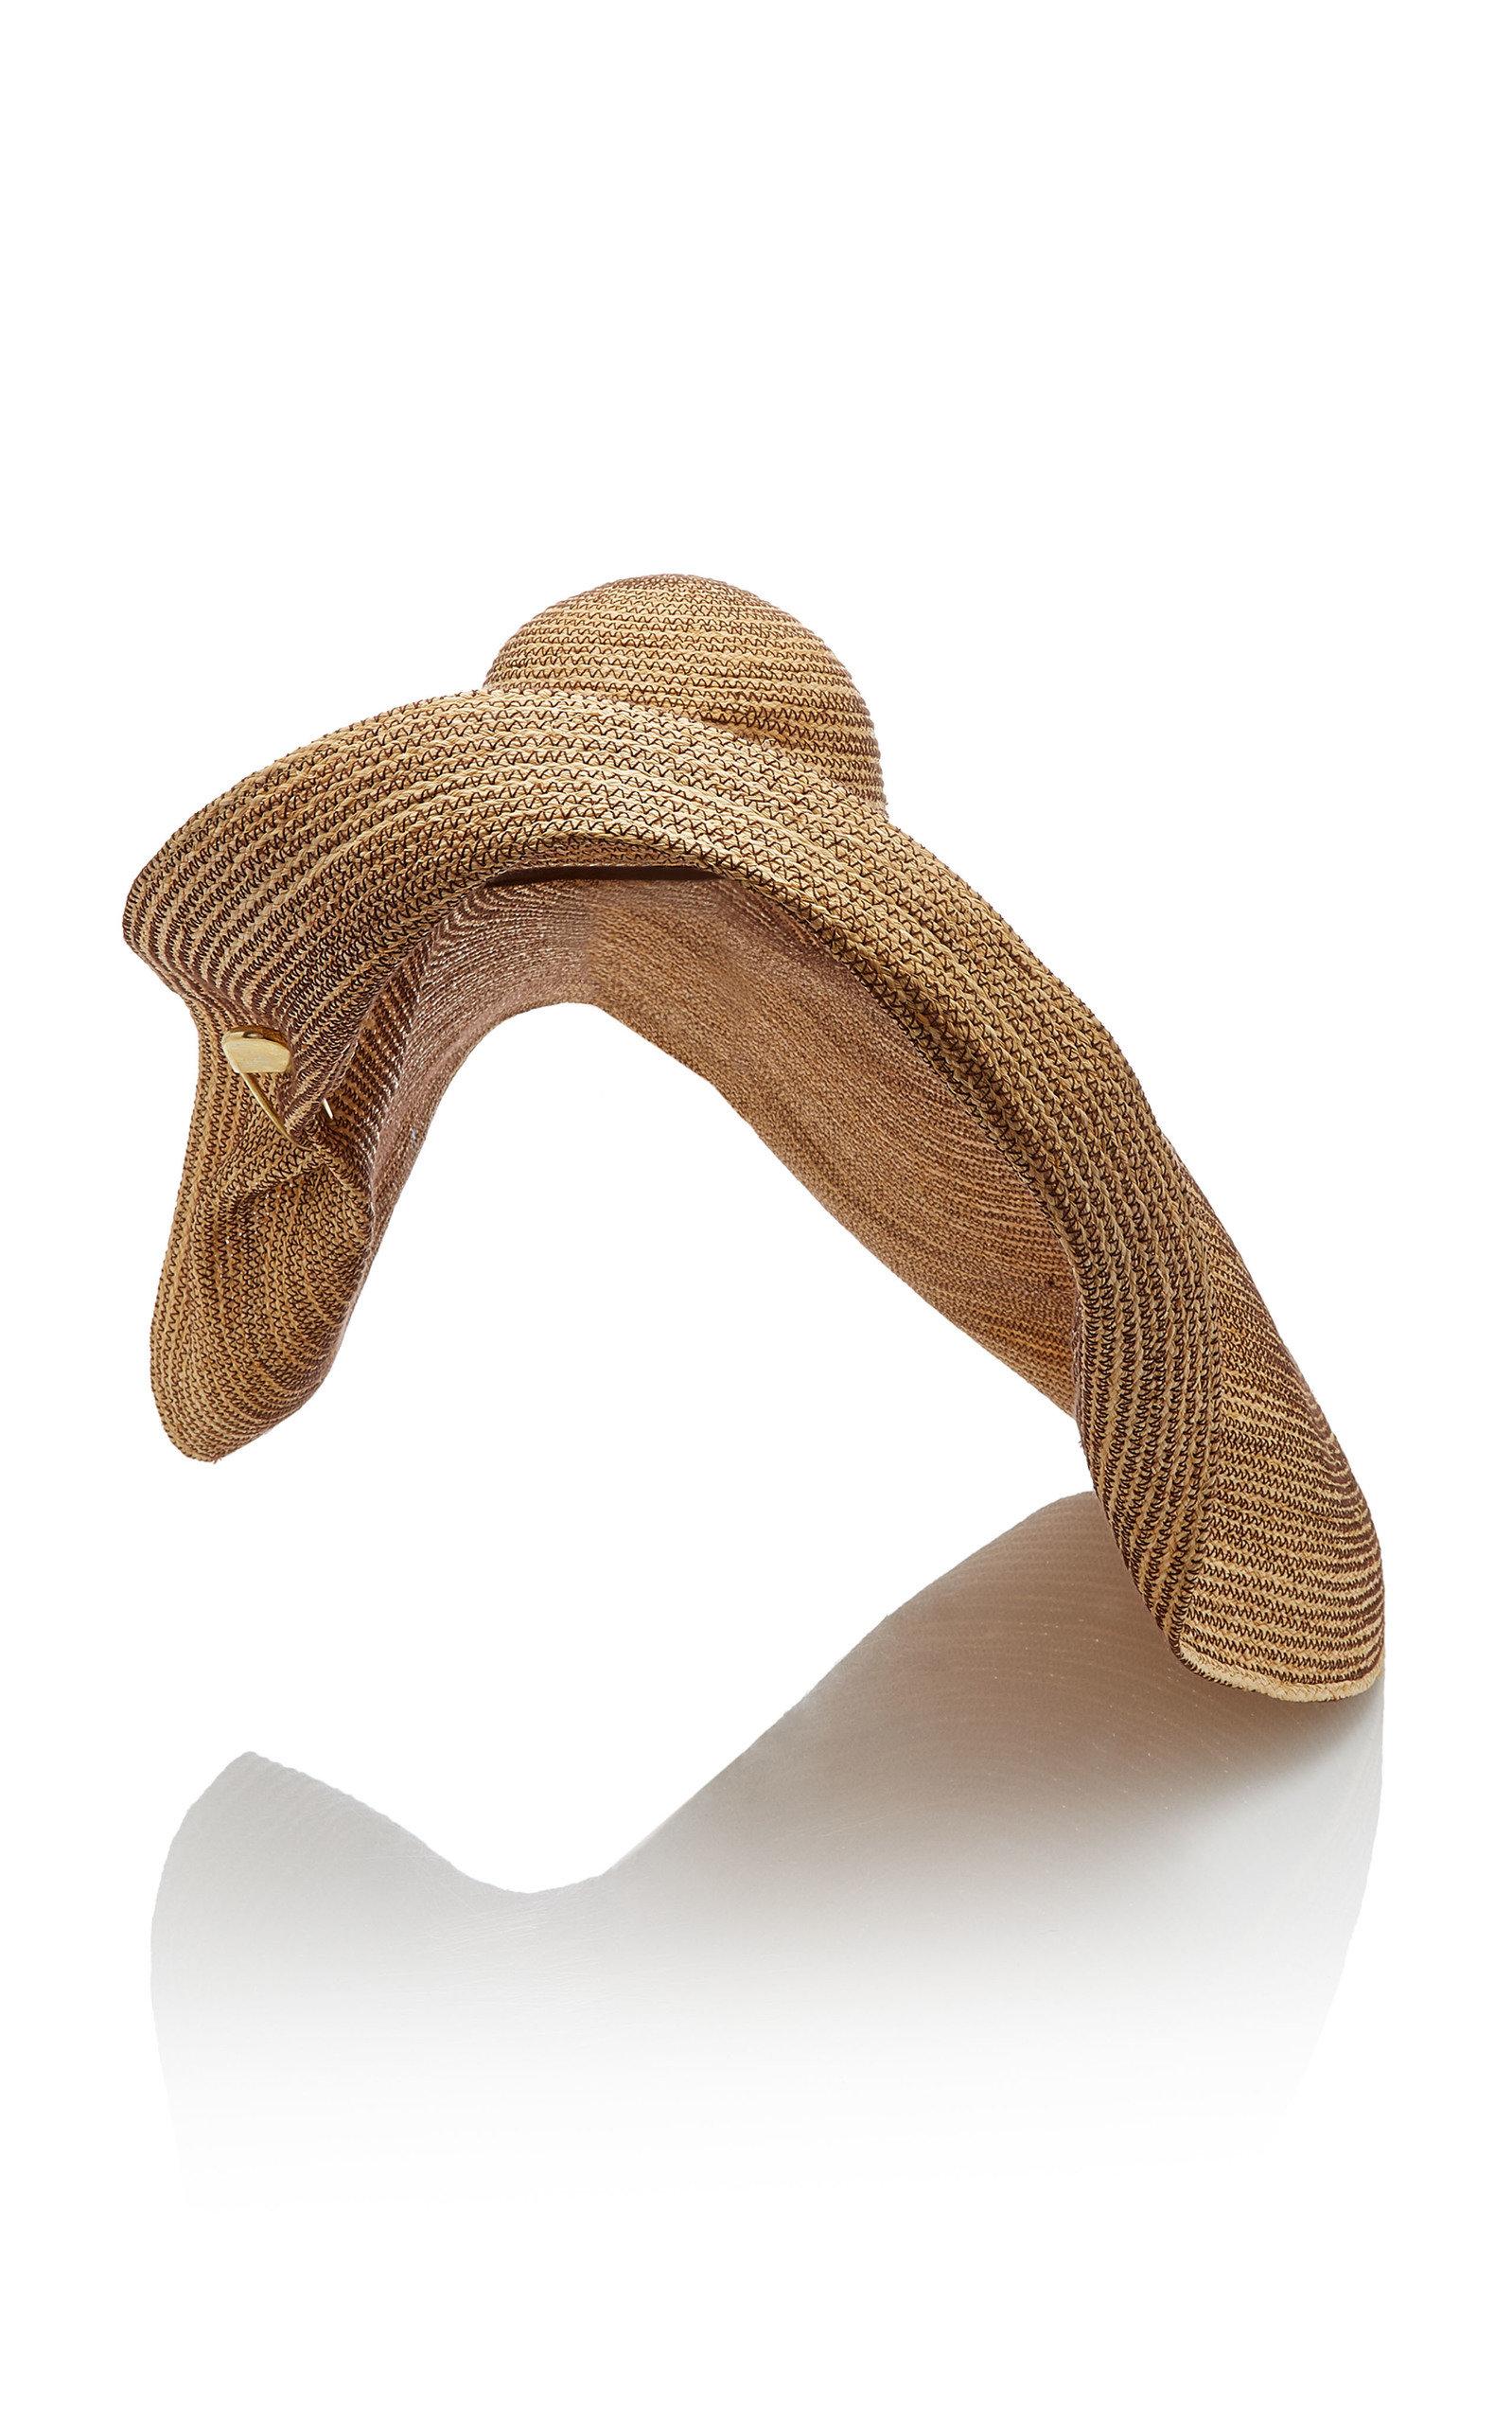 Lola Hats GIGA SPINNER SAFETY PIN RAFFIA HAT